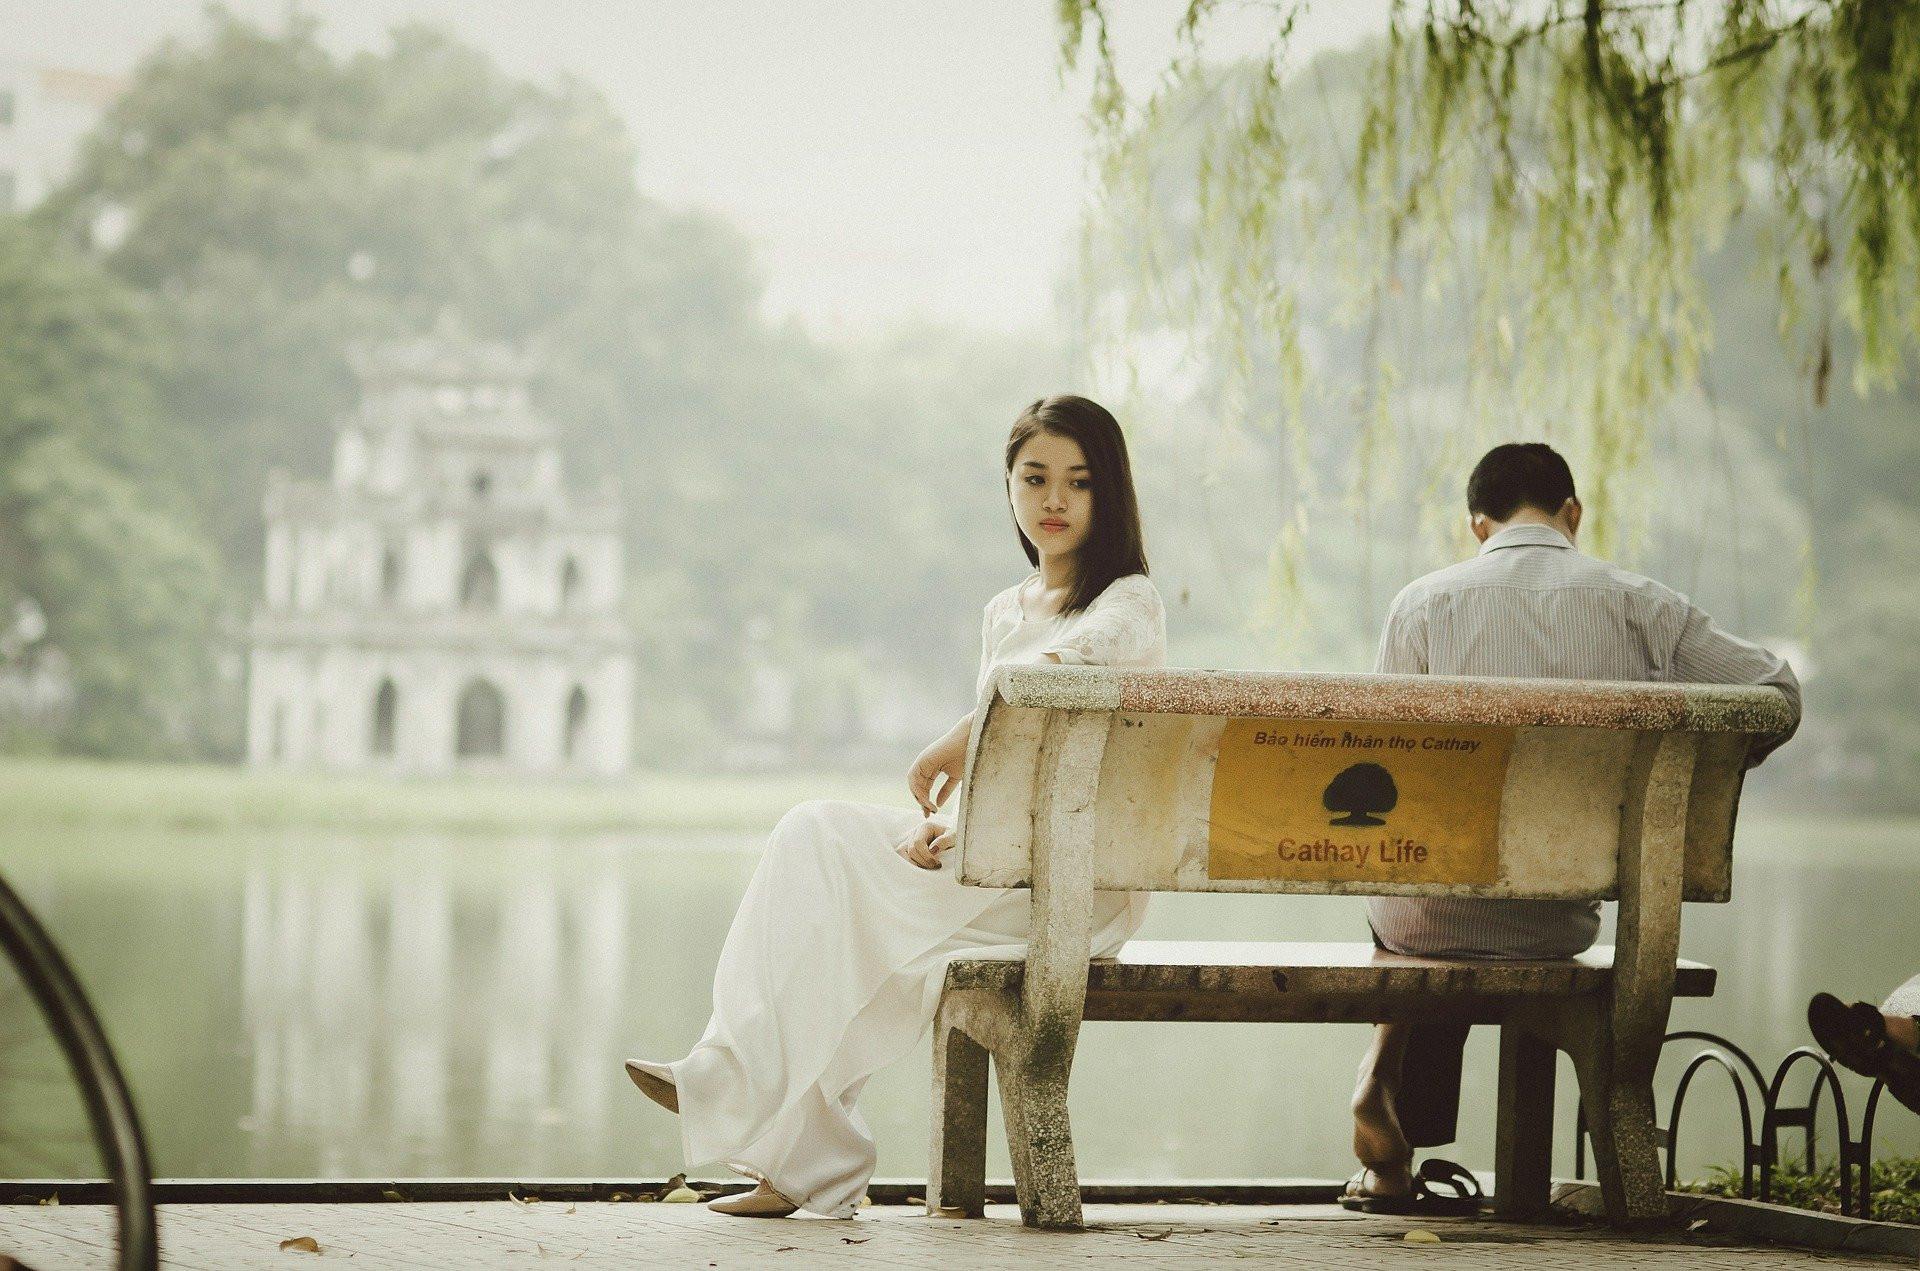 Ini Lho Penyebab Orang Ketagihan Selingkuh - JPNN.com